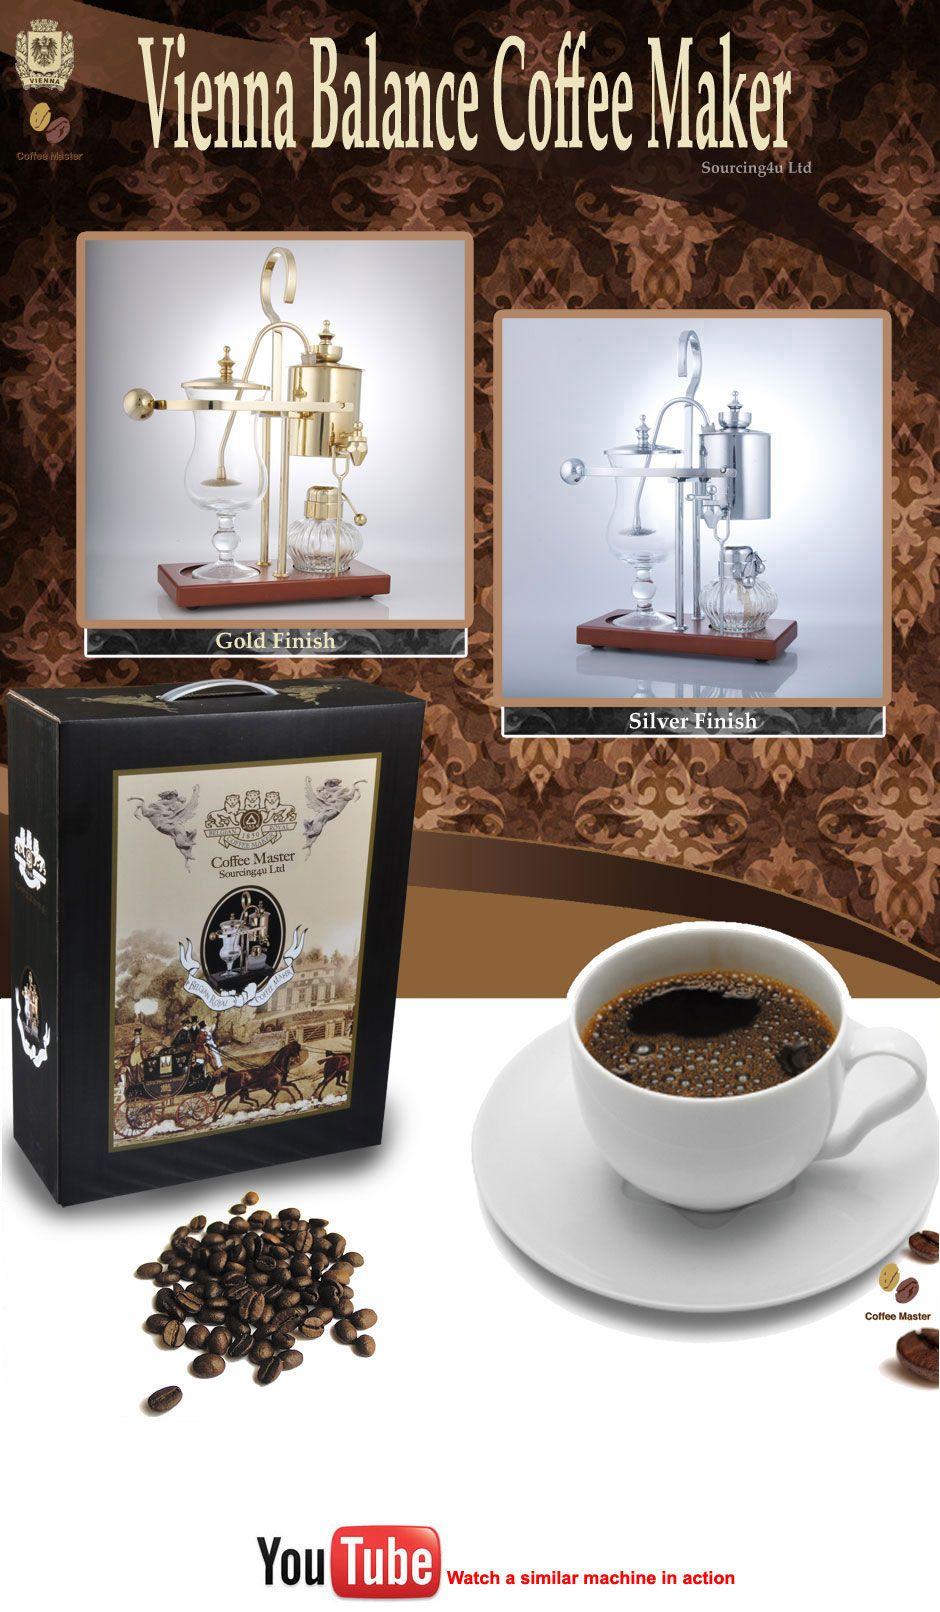 COFFEE-MASTER VIENNA BALANCE SYPHON COFFEE MAKER SIPHON   eBay